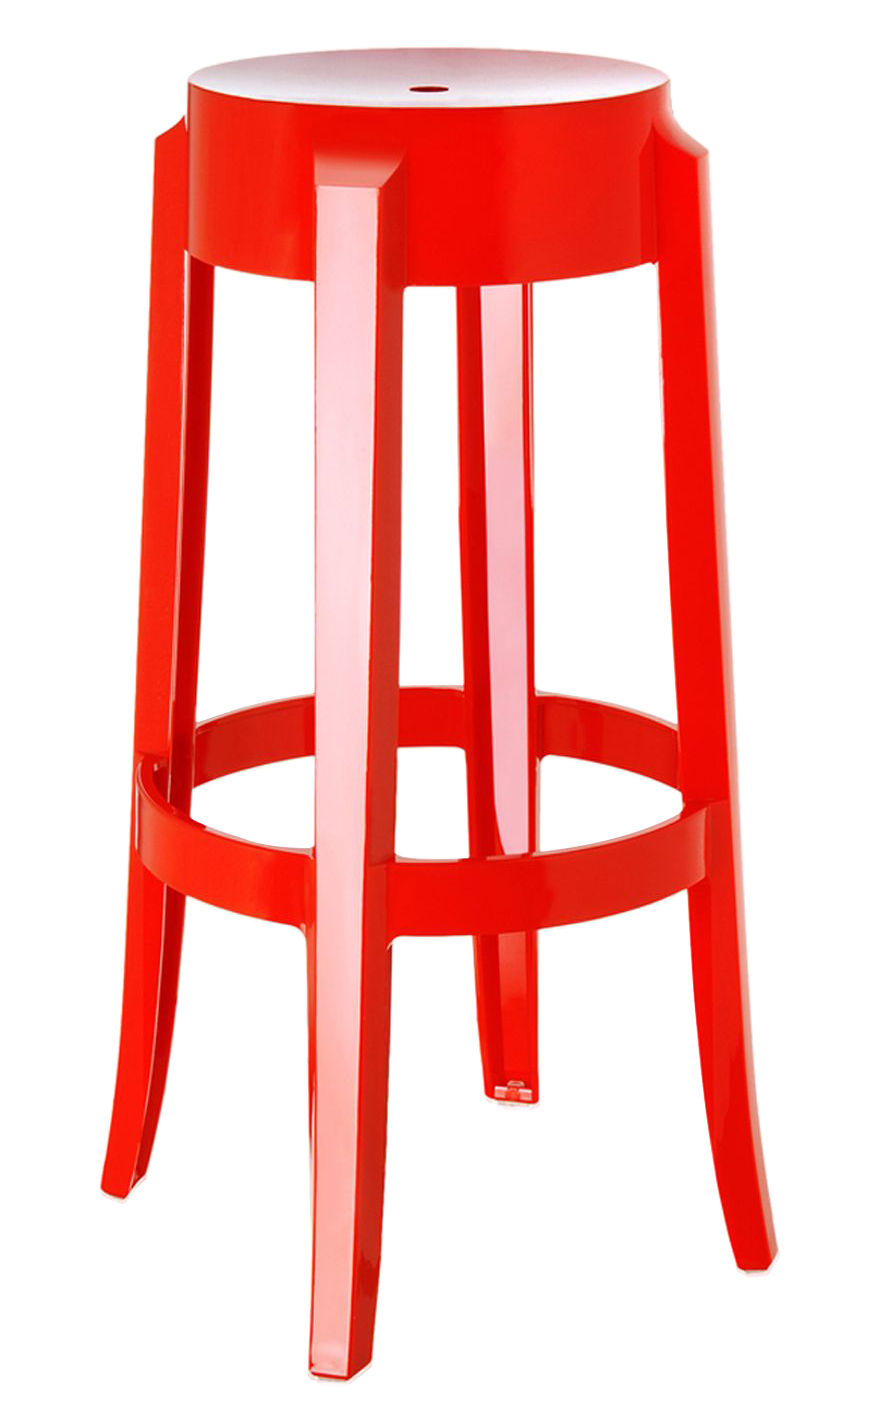 Tabouret haut empilable charles ghost h 75 cm plastique rouge opaque kartell - Tabouret plastique empilable ...